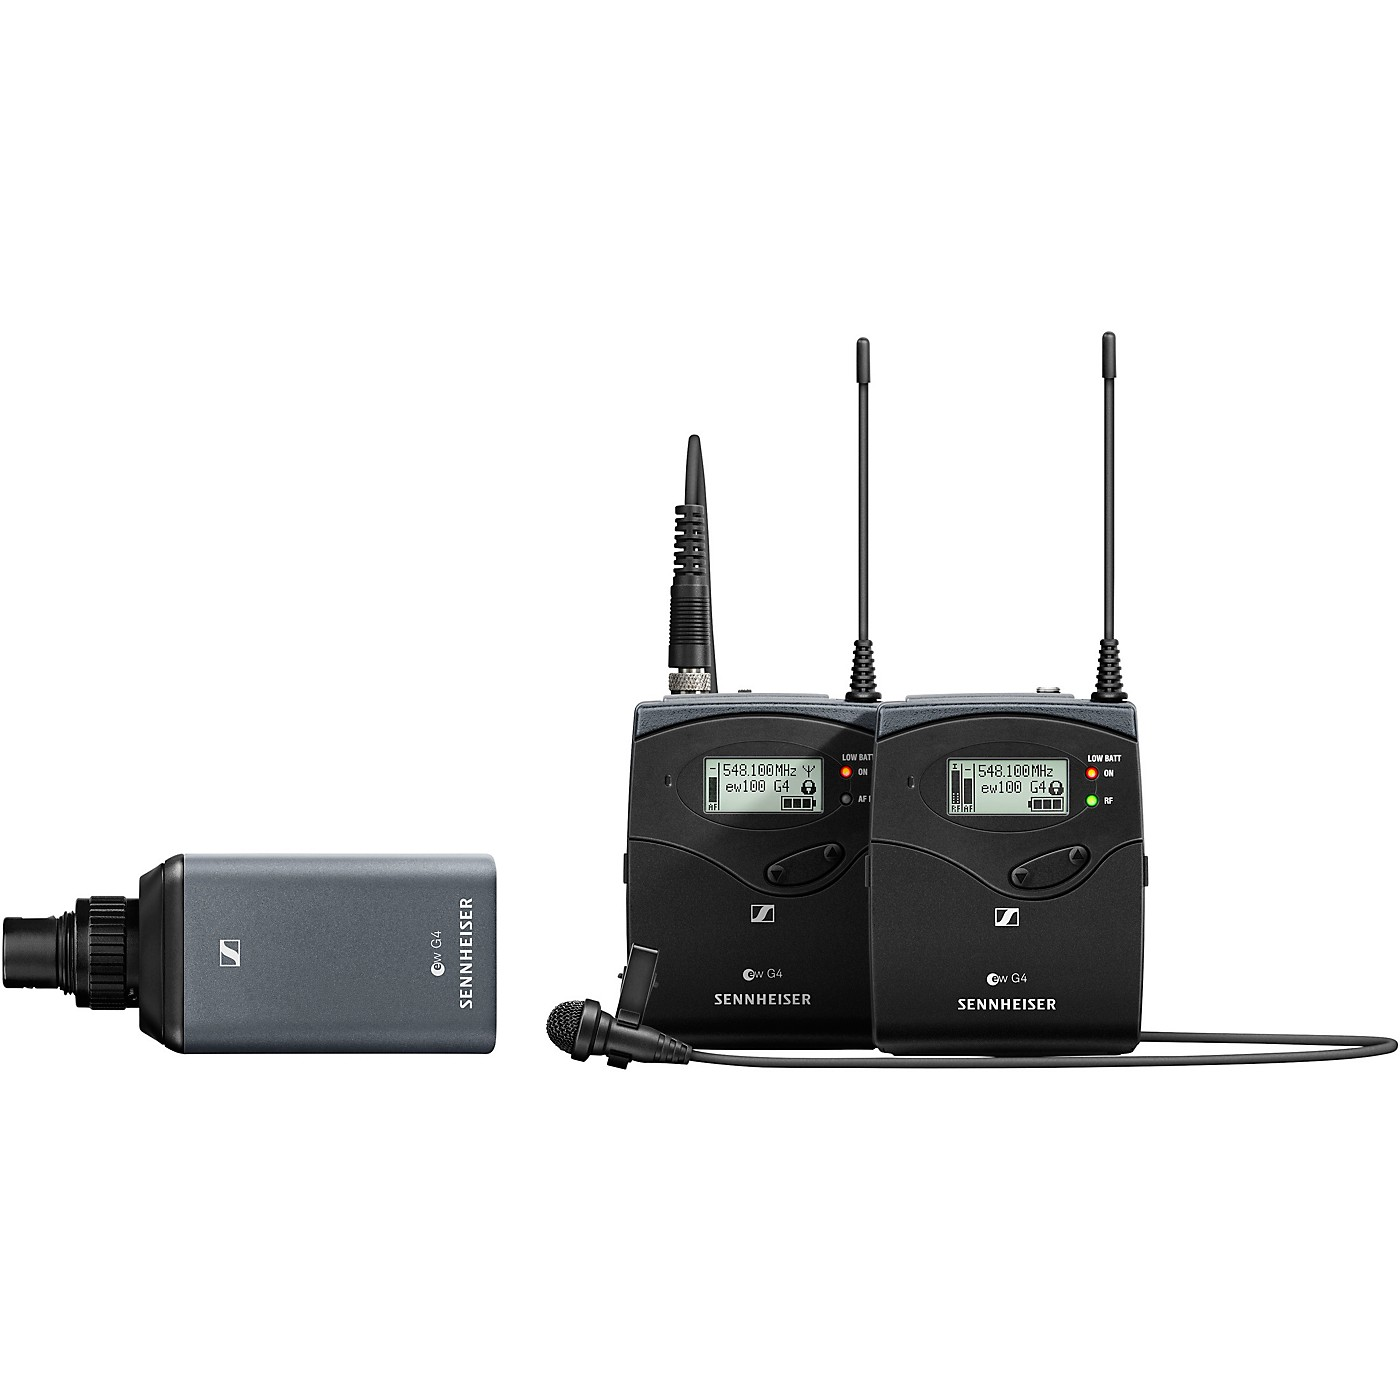 Sennheiser ew 100 ENG G4 Portable Wireless Combo Set thumbnail